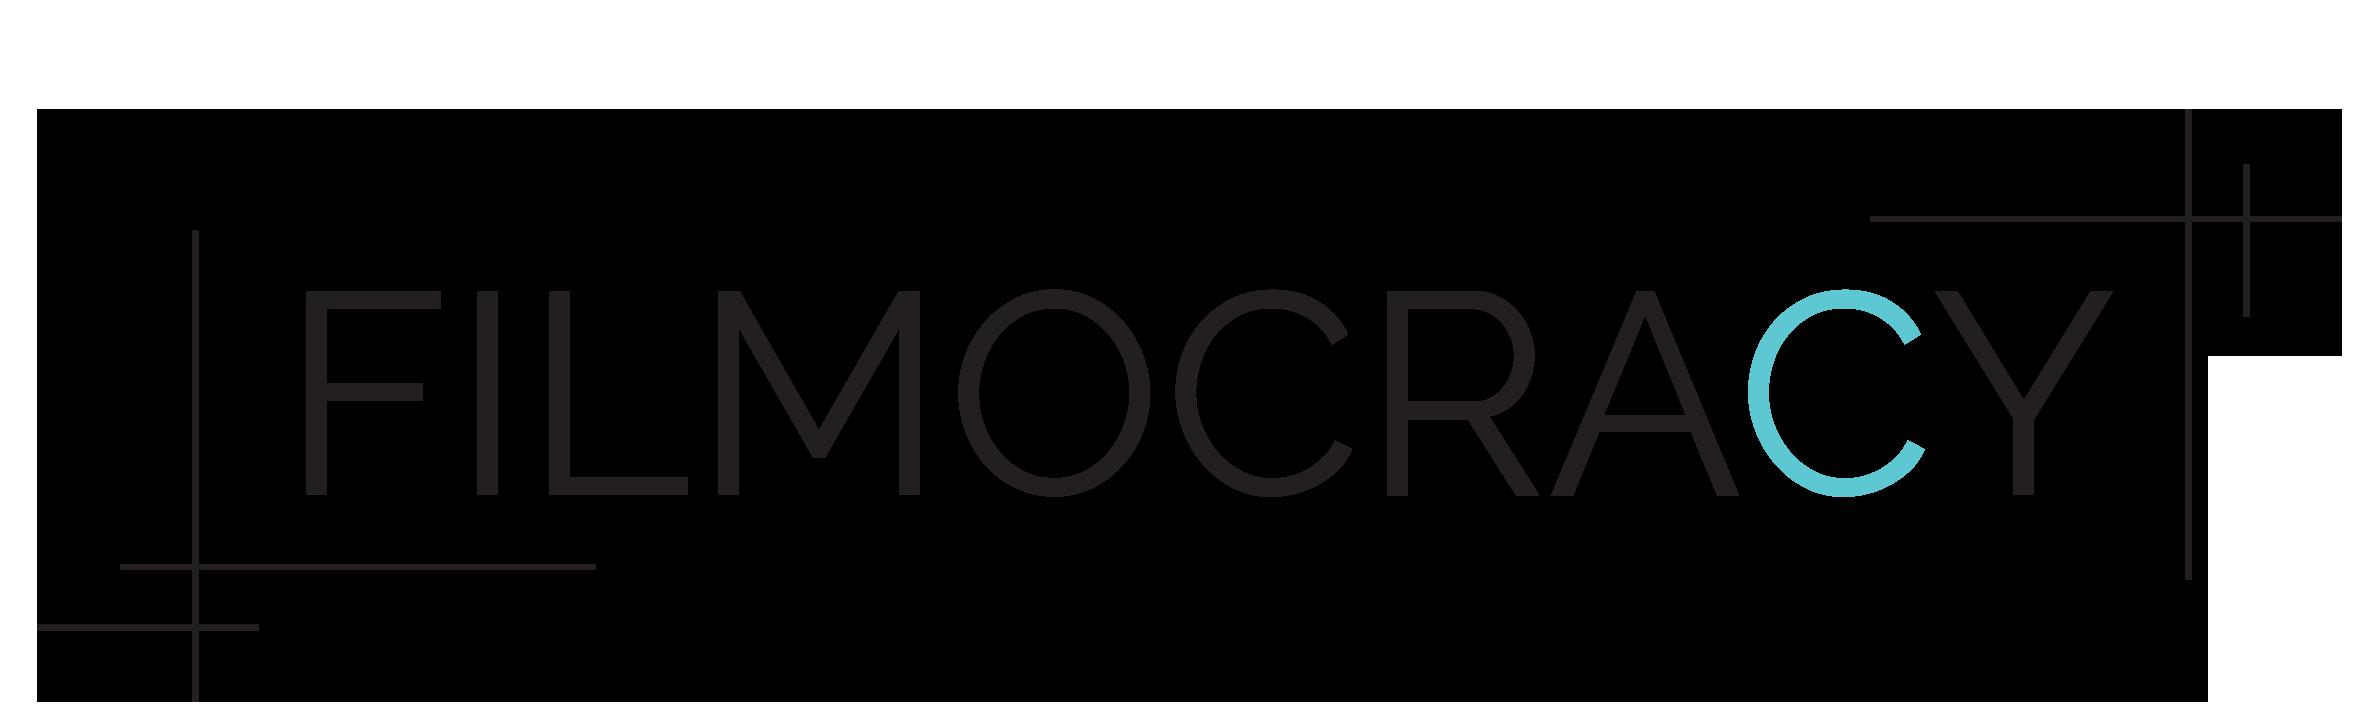 Filmocracy Logo Transparent.png